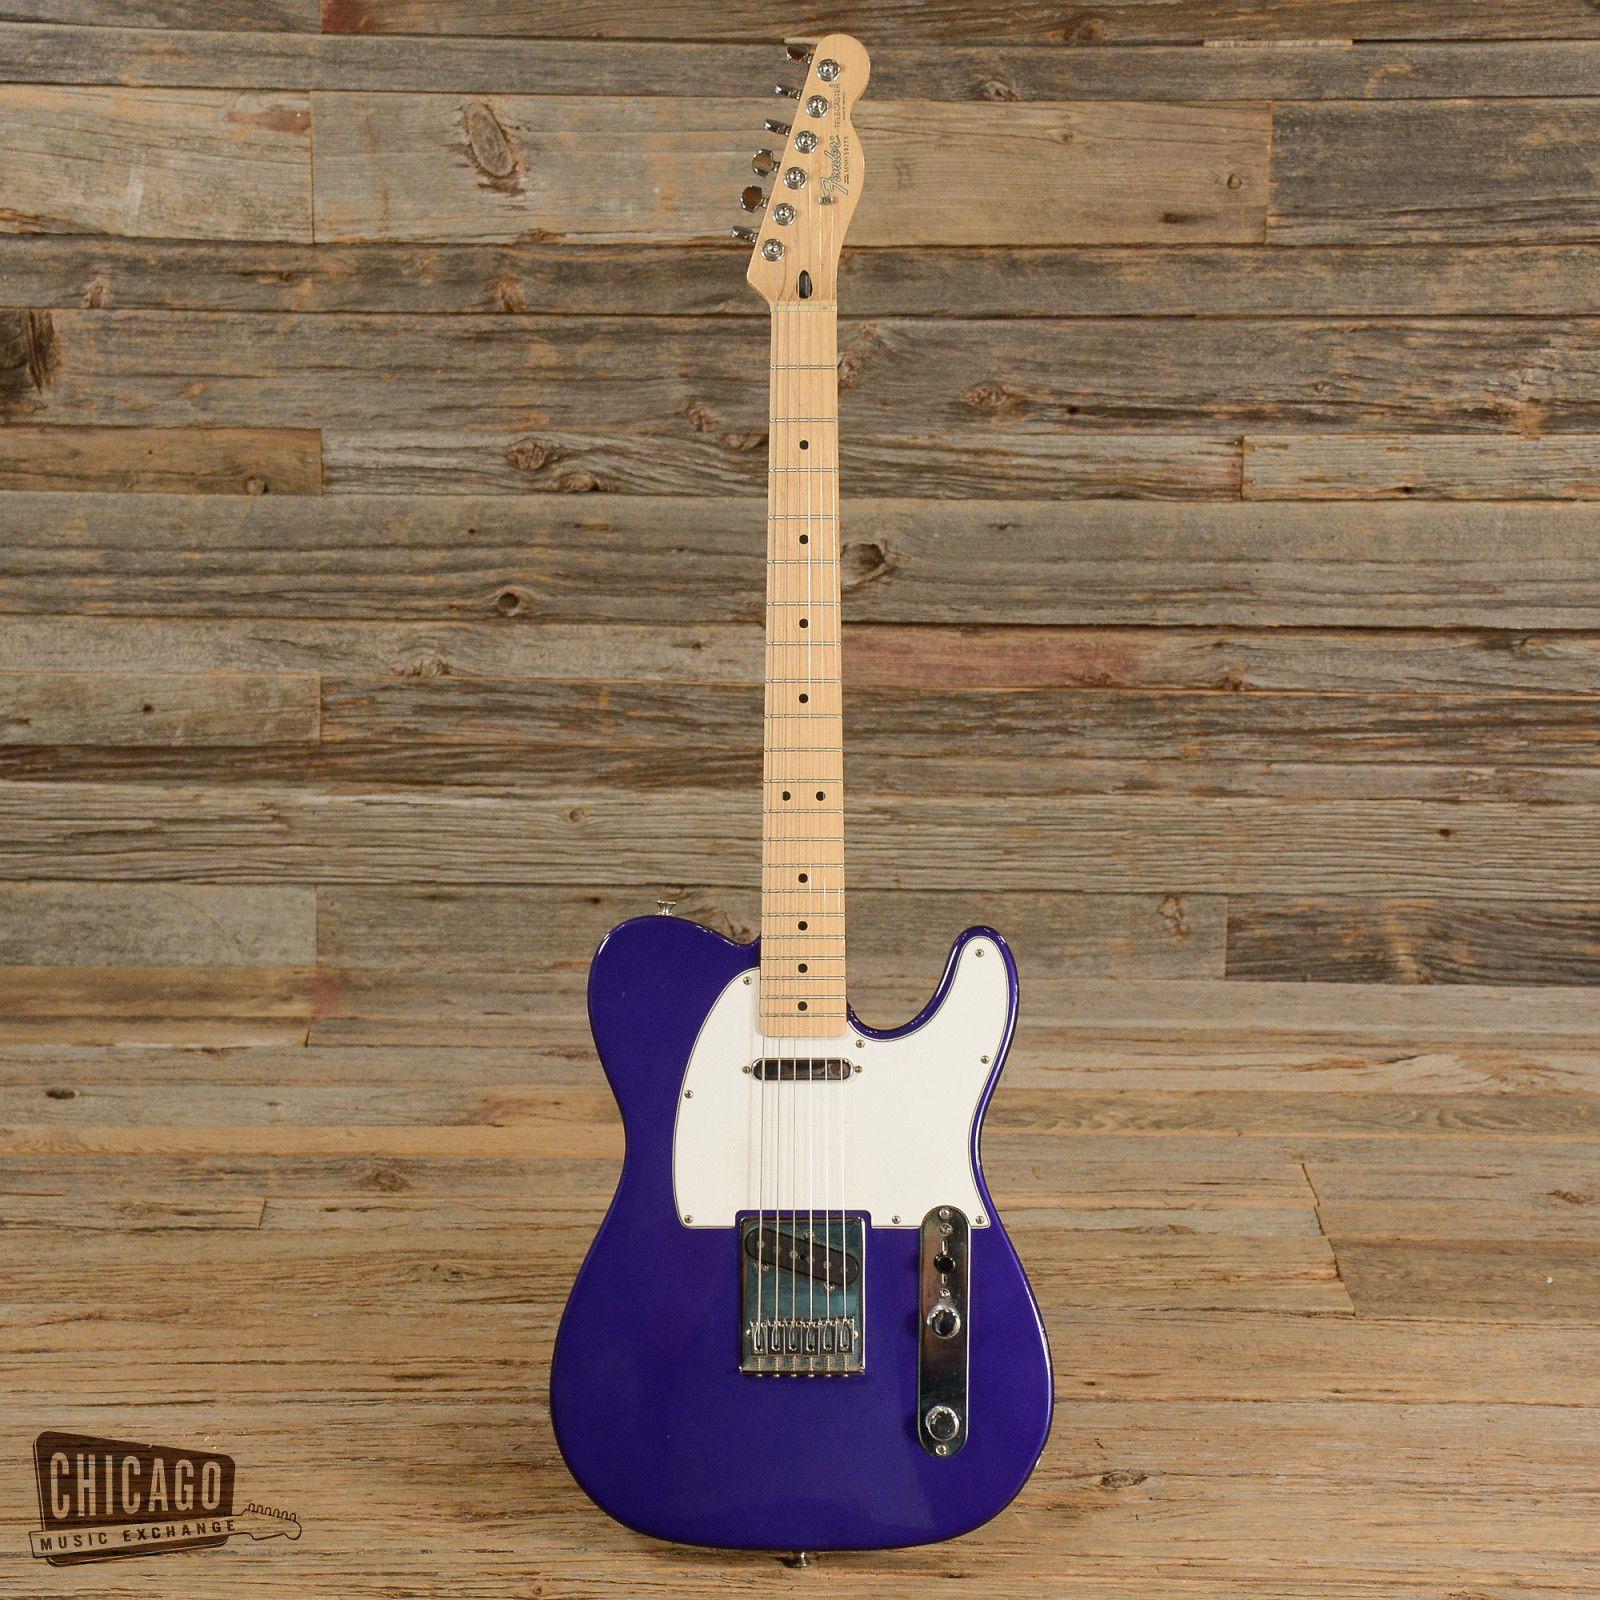 Fender Telecaster MIM Purple.jpg